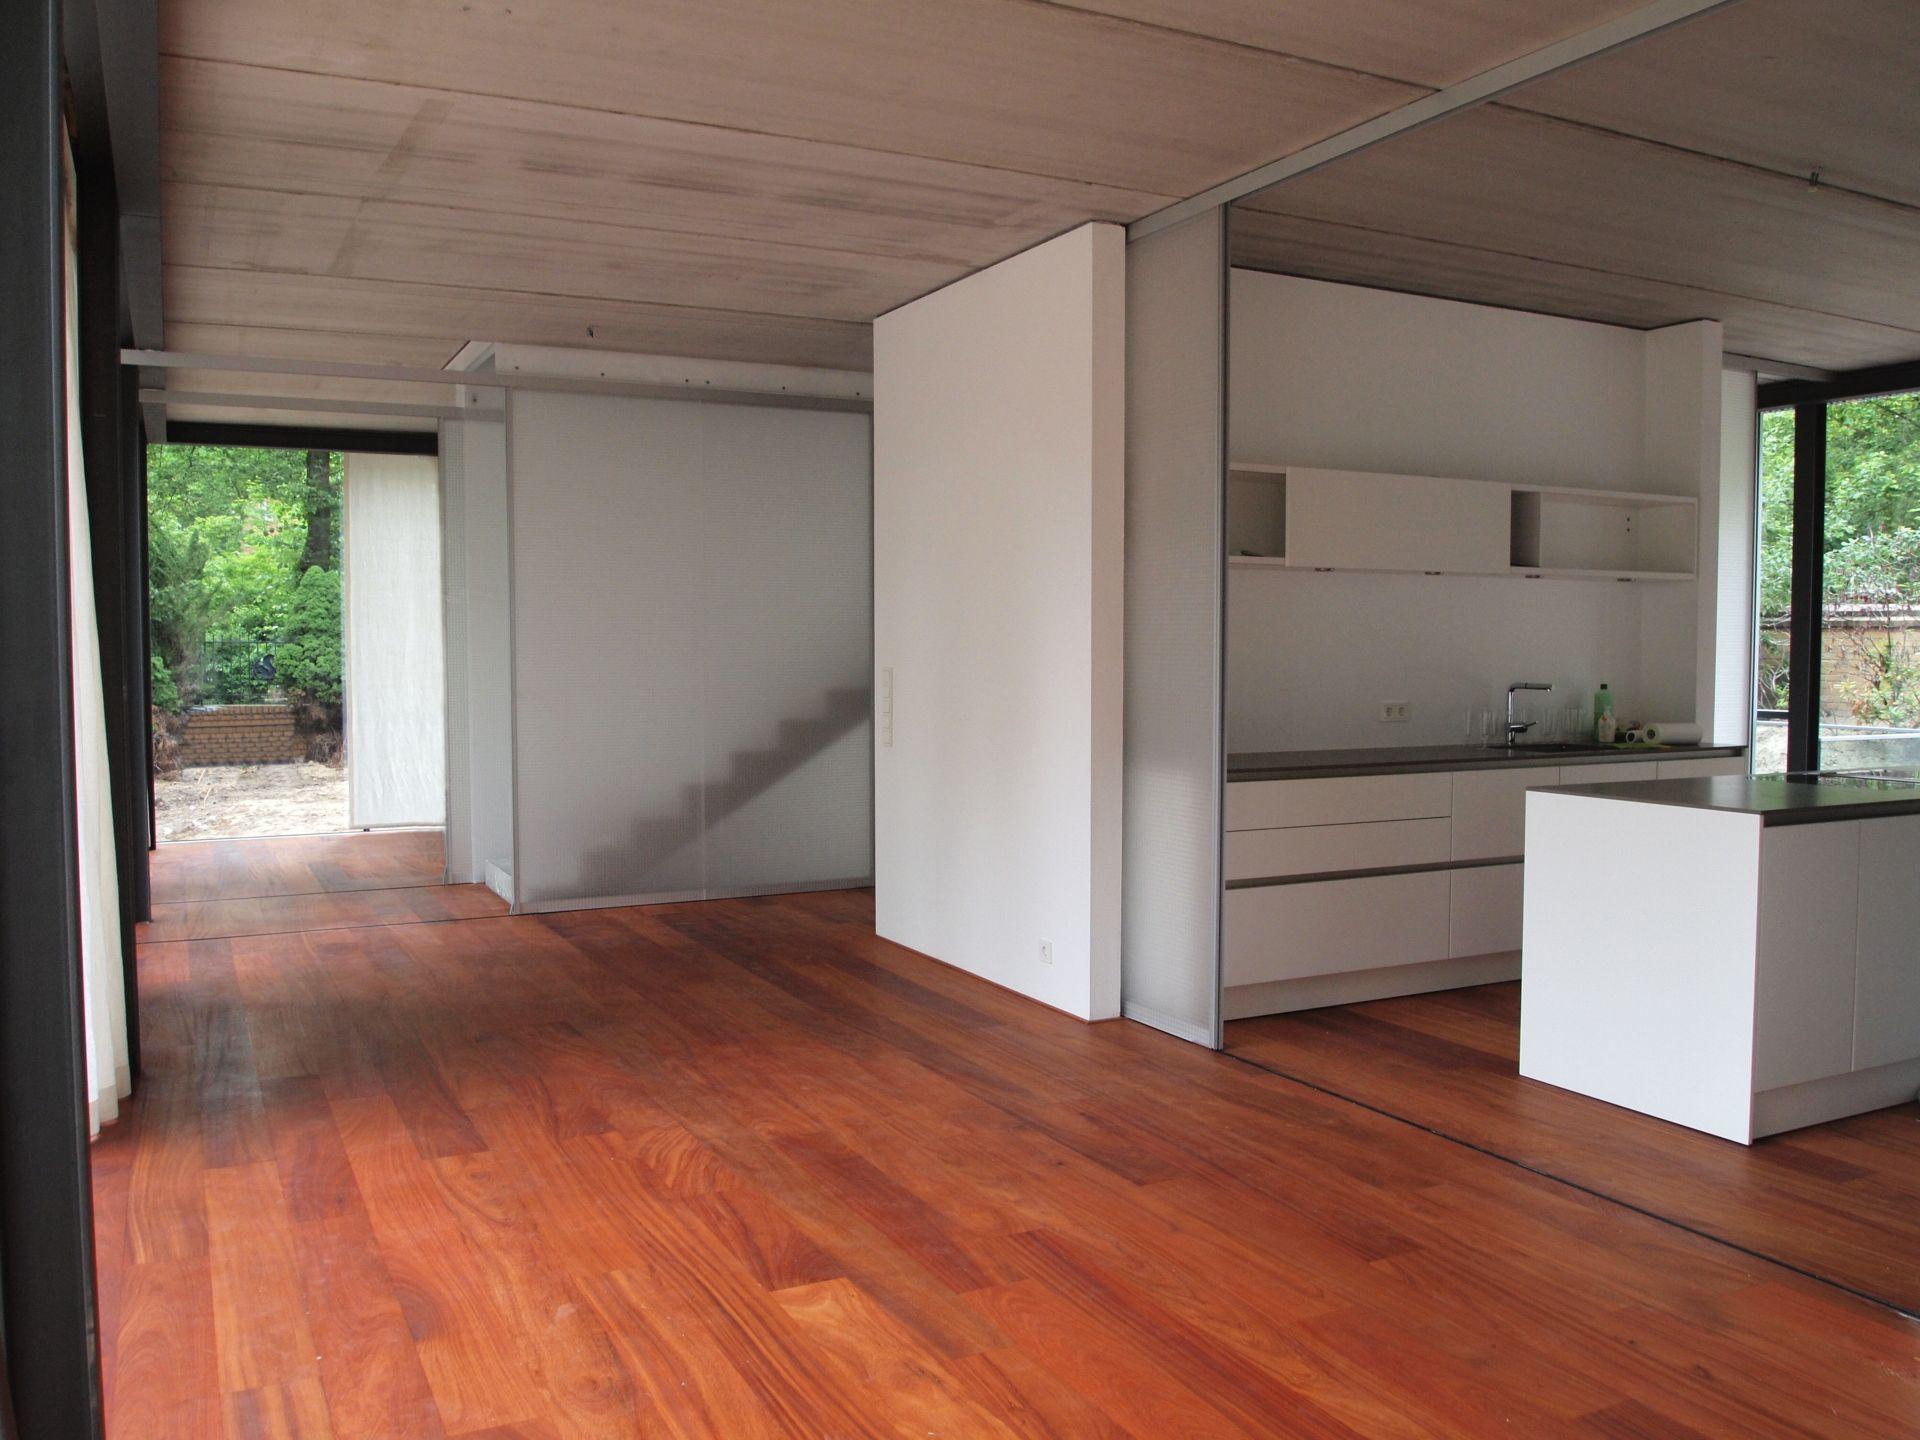 k che mit glas schiebet r. Black Bedroom Furniture Sets. Home Design Ideas